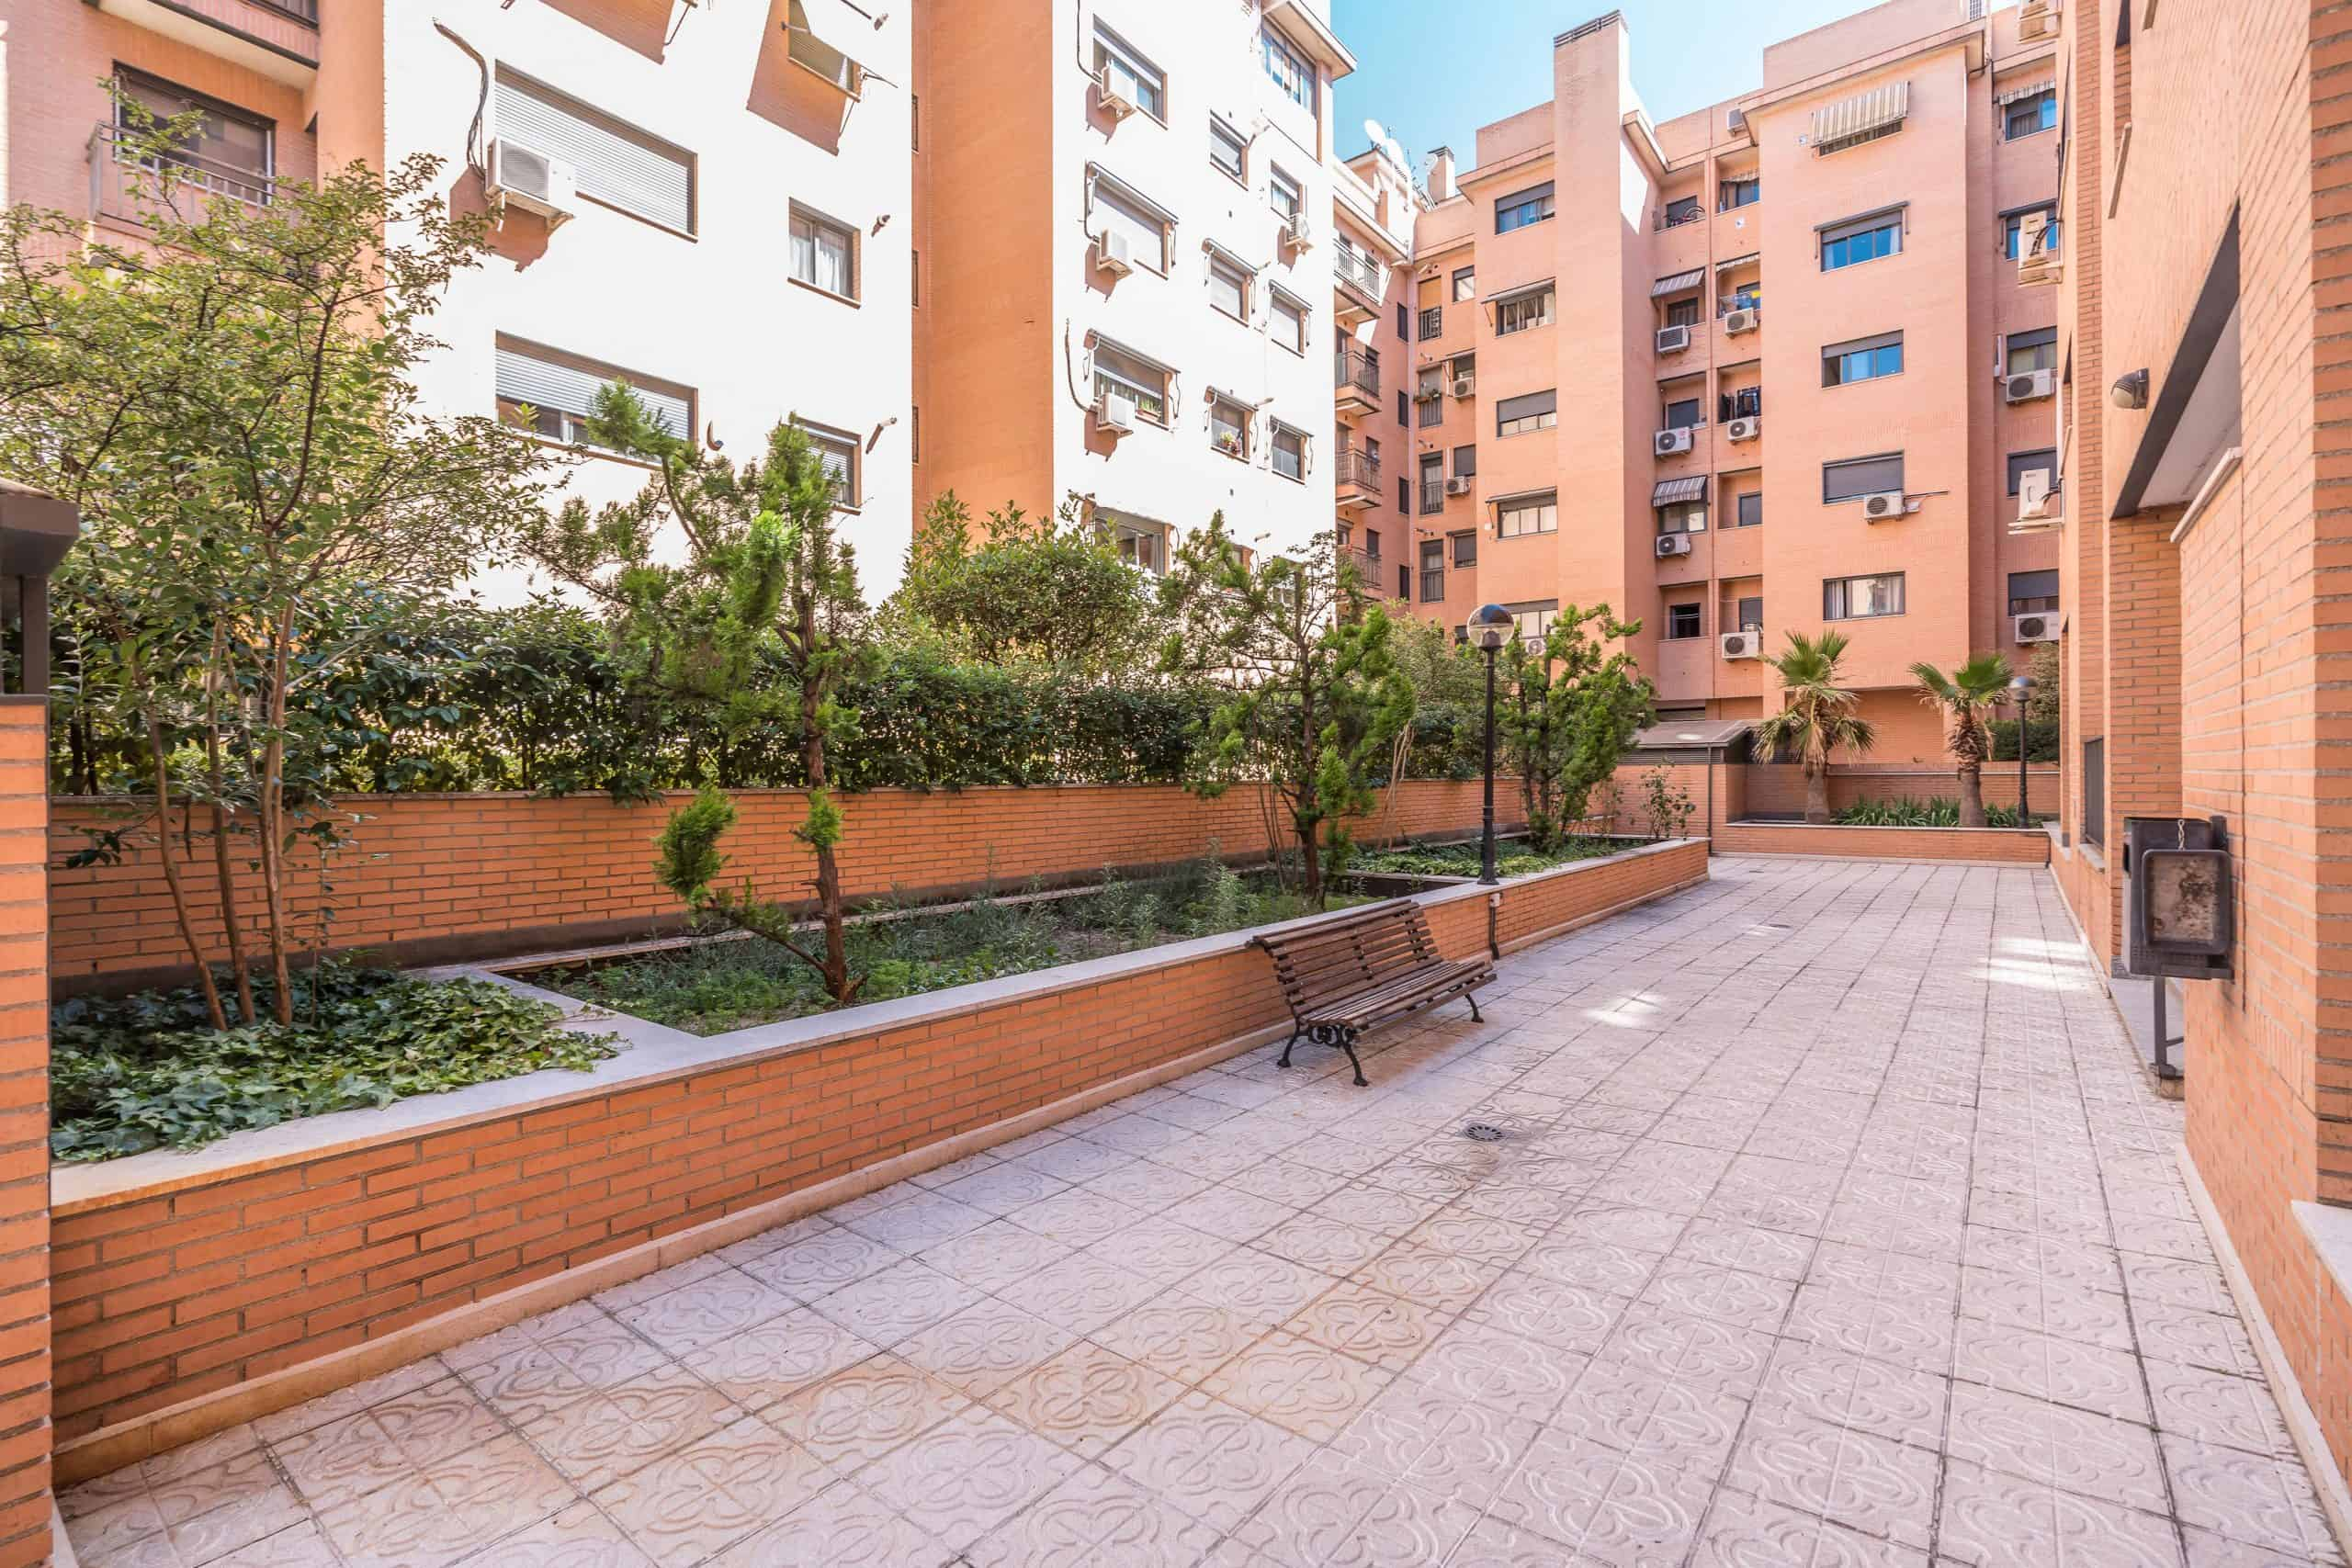 Agencia Inmobiliaria de Madrid-FUTUROCASA-Zona ARGANZUELA-EMBAJADORES-LEGAZPI13 ZONAS COMUNES (4)